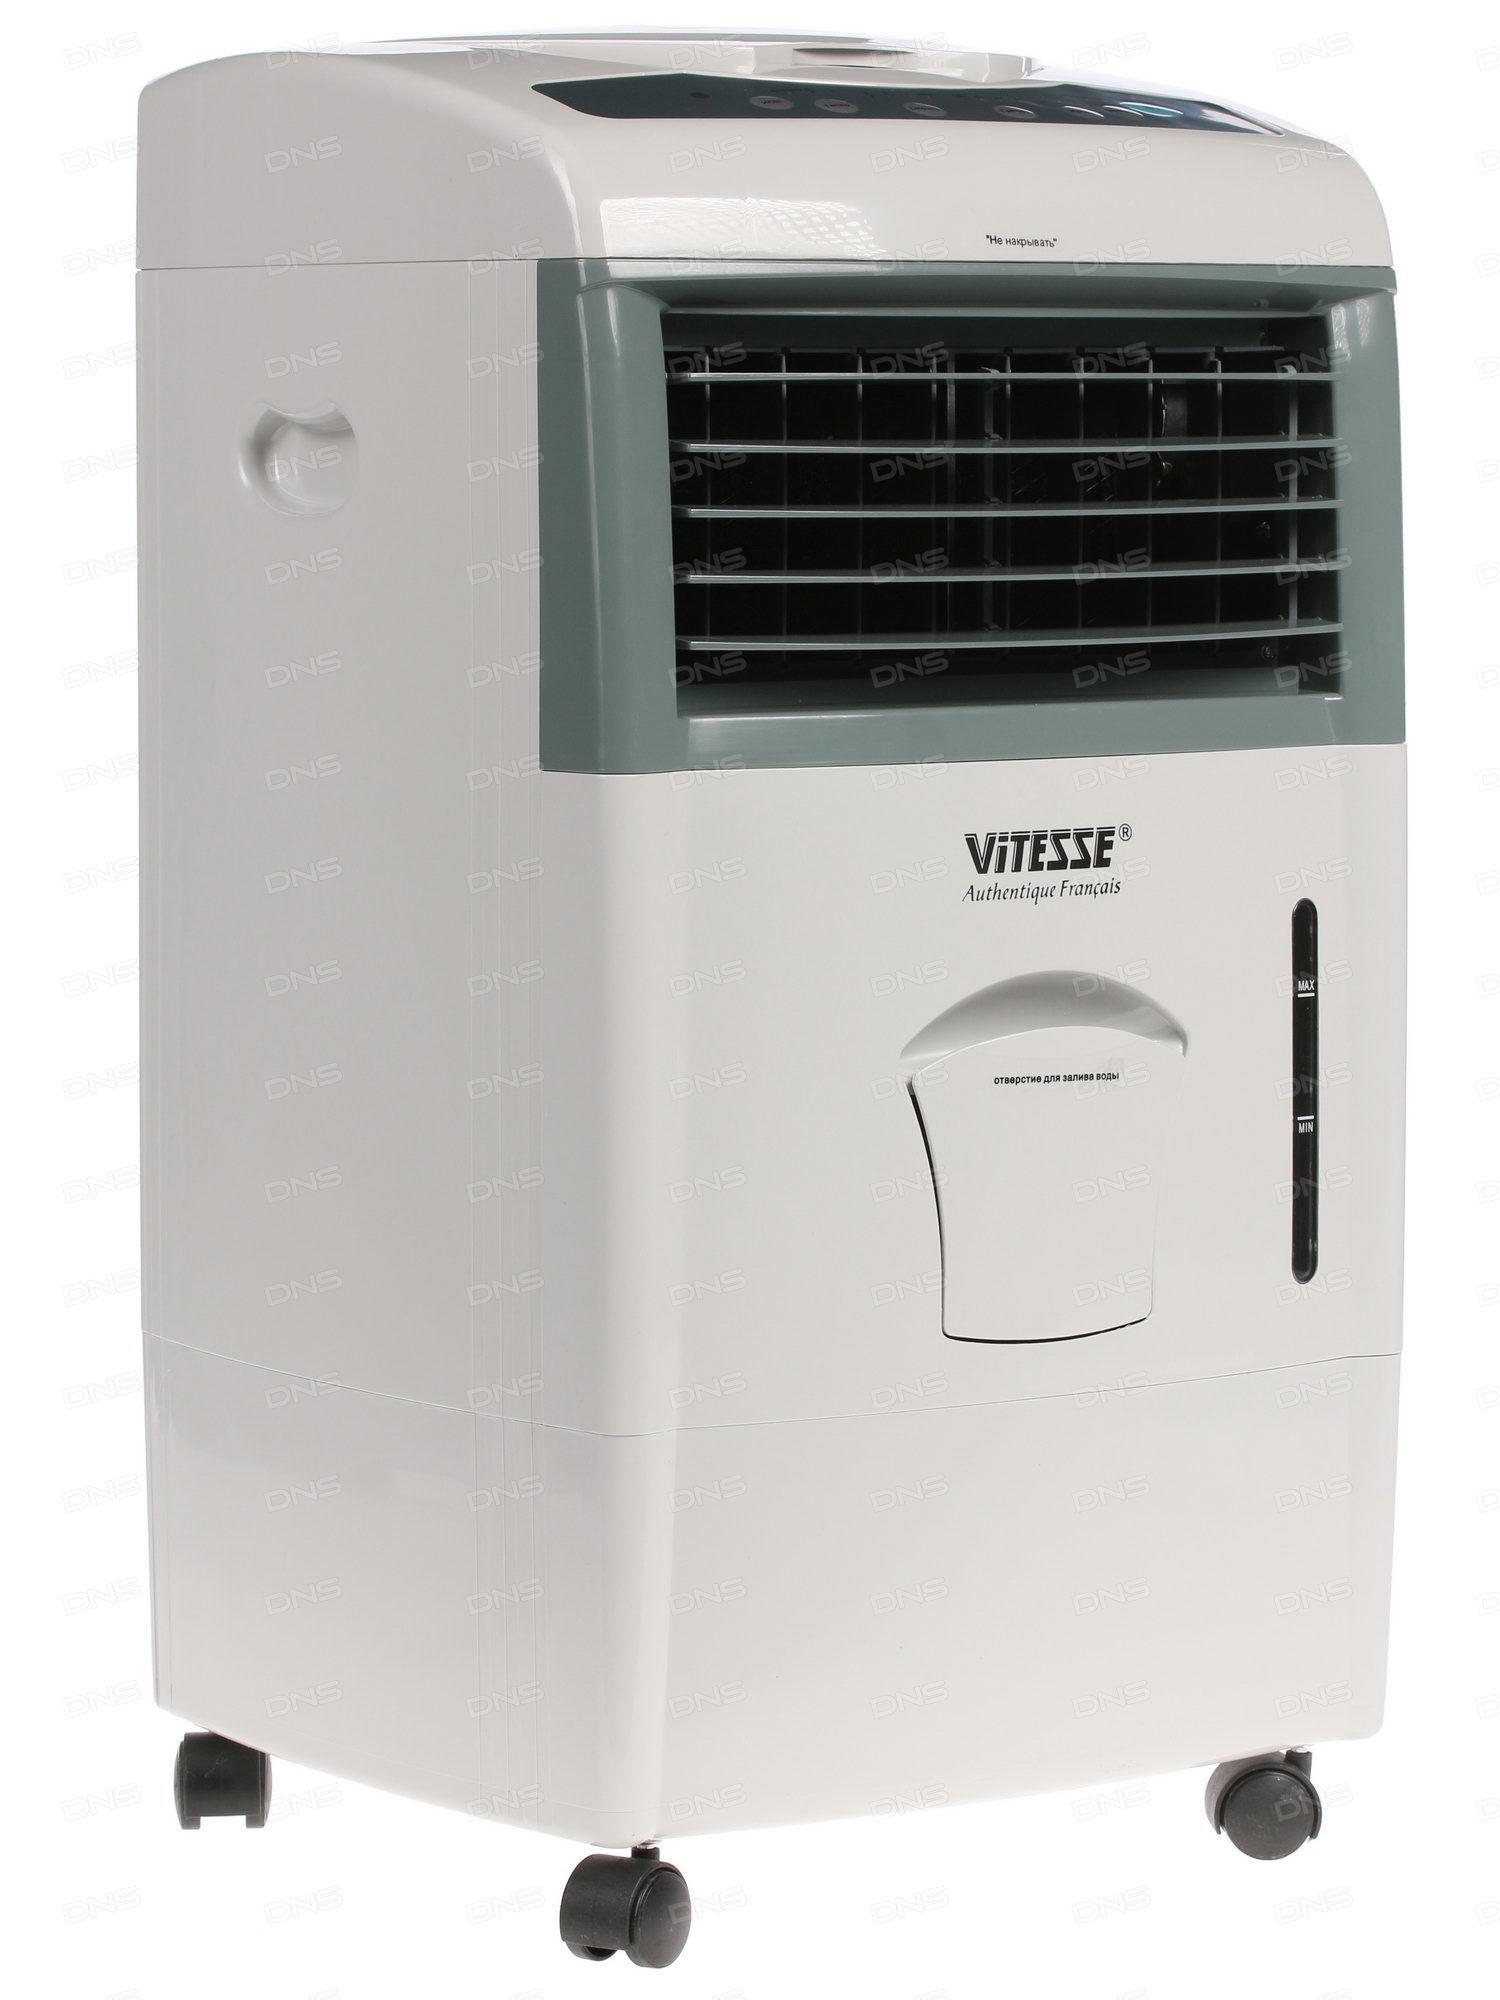 Vitesse VS-867